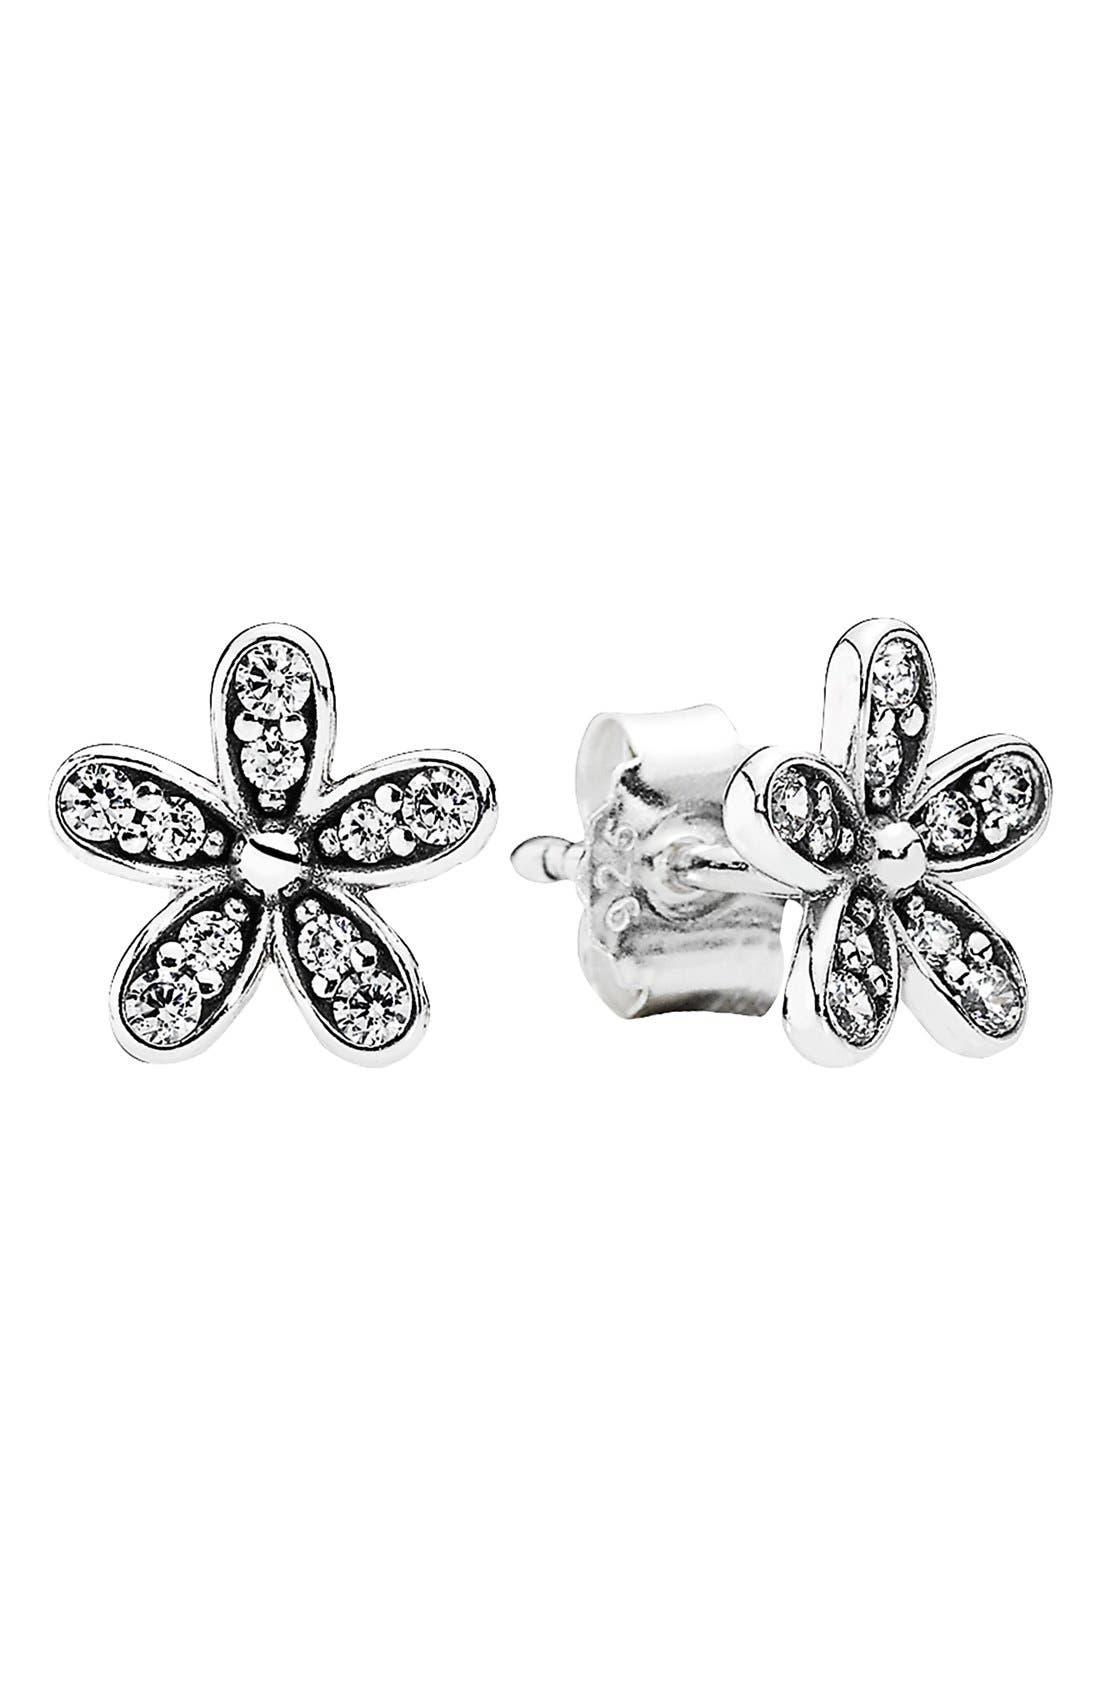 Alternate Image 1 Selected - PANDORA 'Dazzling Daisy' Mini Stud Earrings